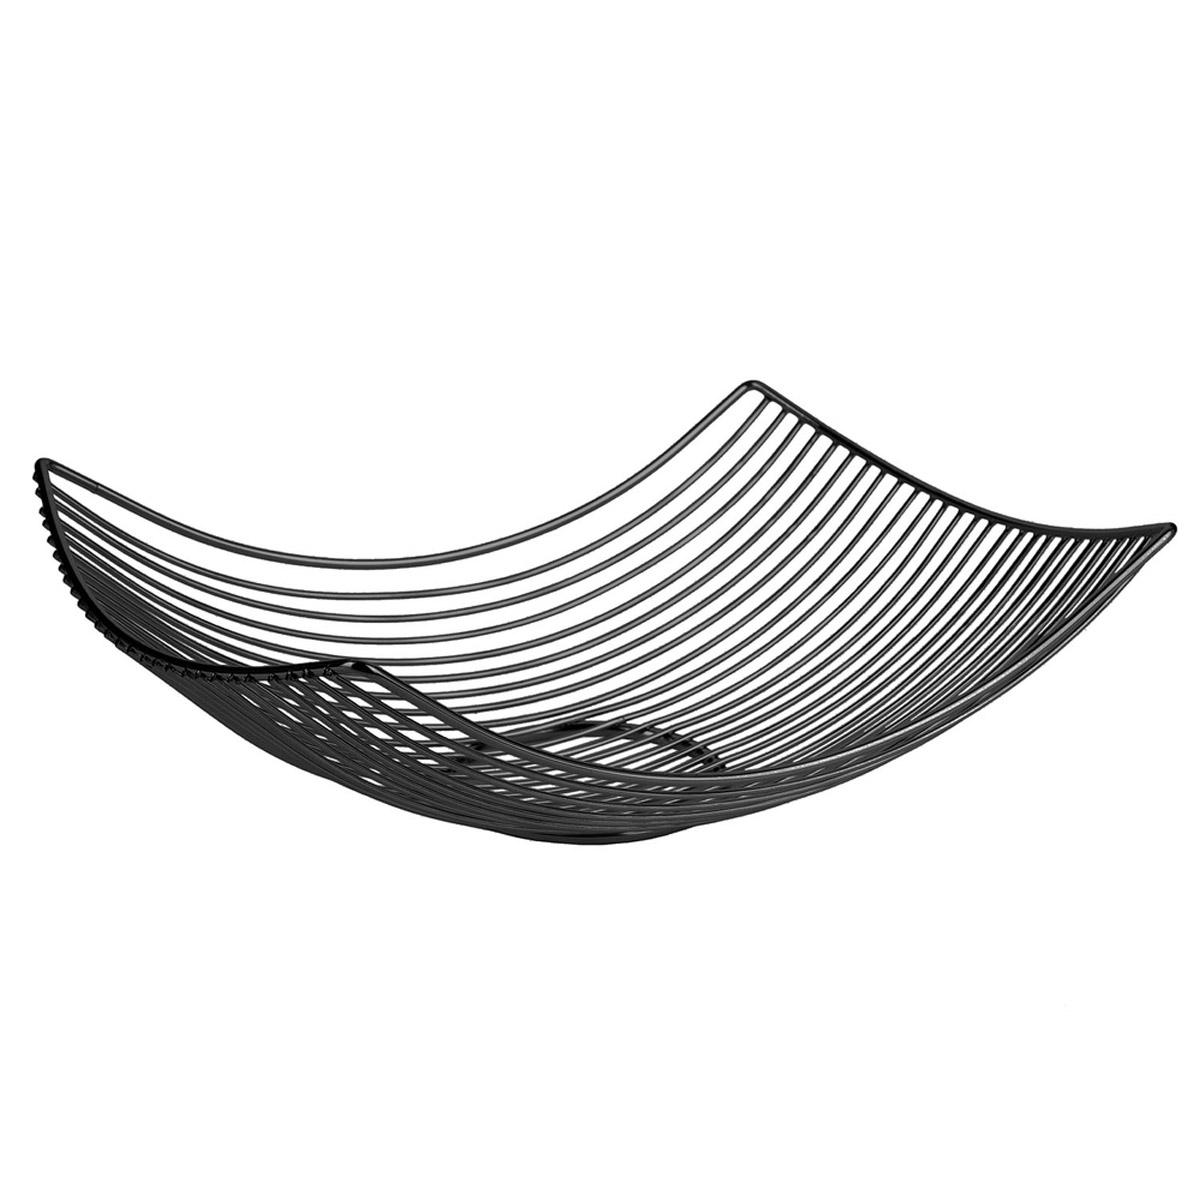 Corbeille filaire métal \'Boho\' noir - 31x23x10 cm - [R2431]